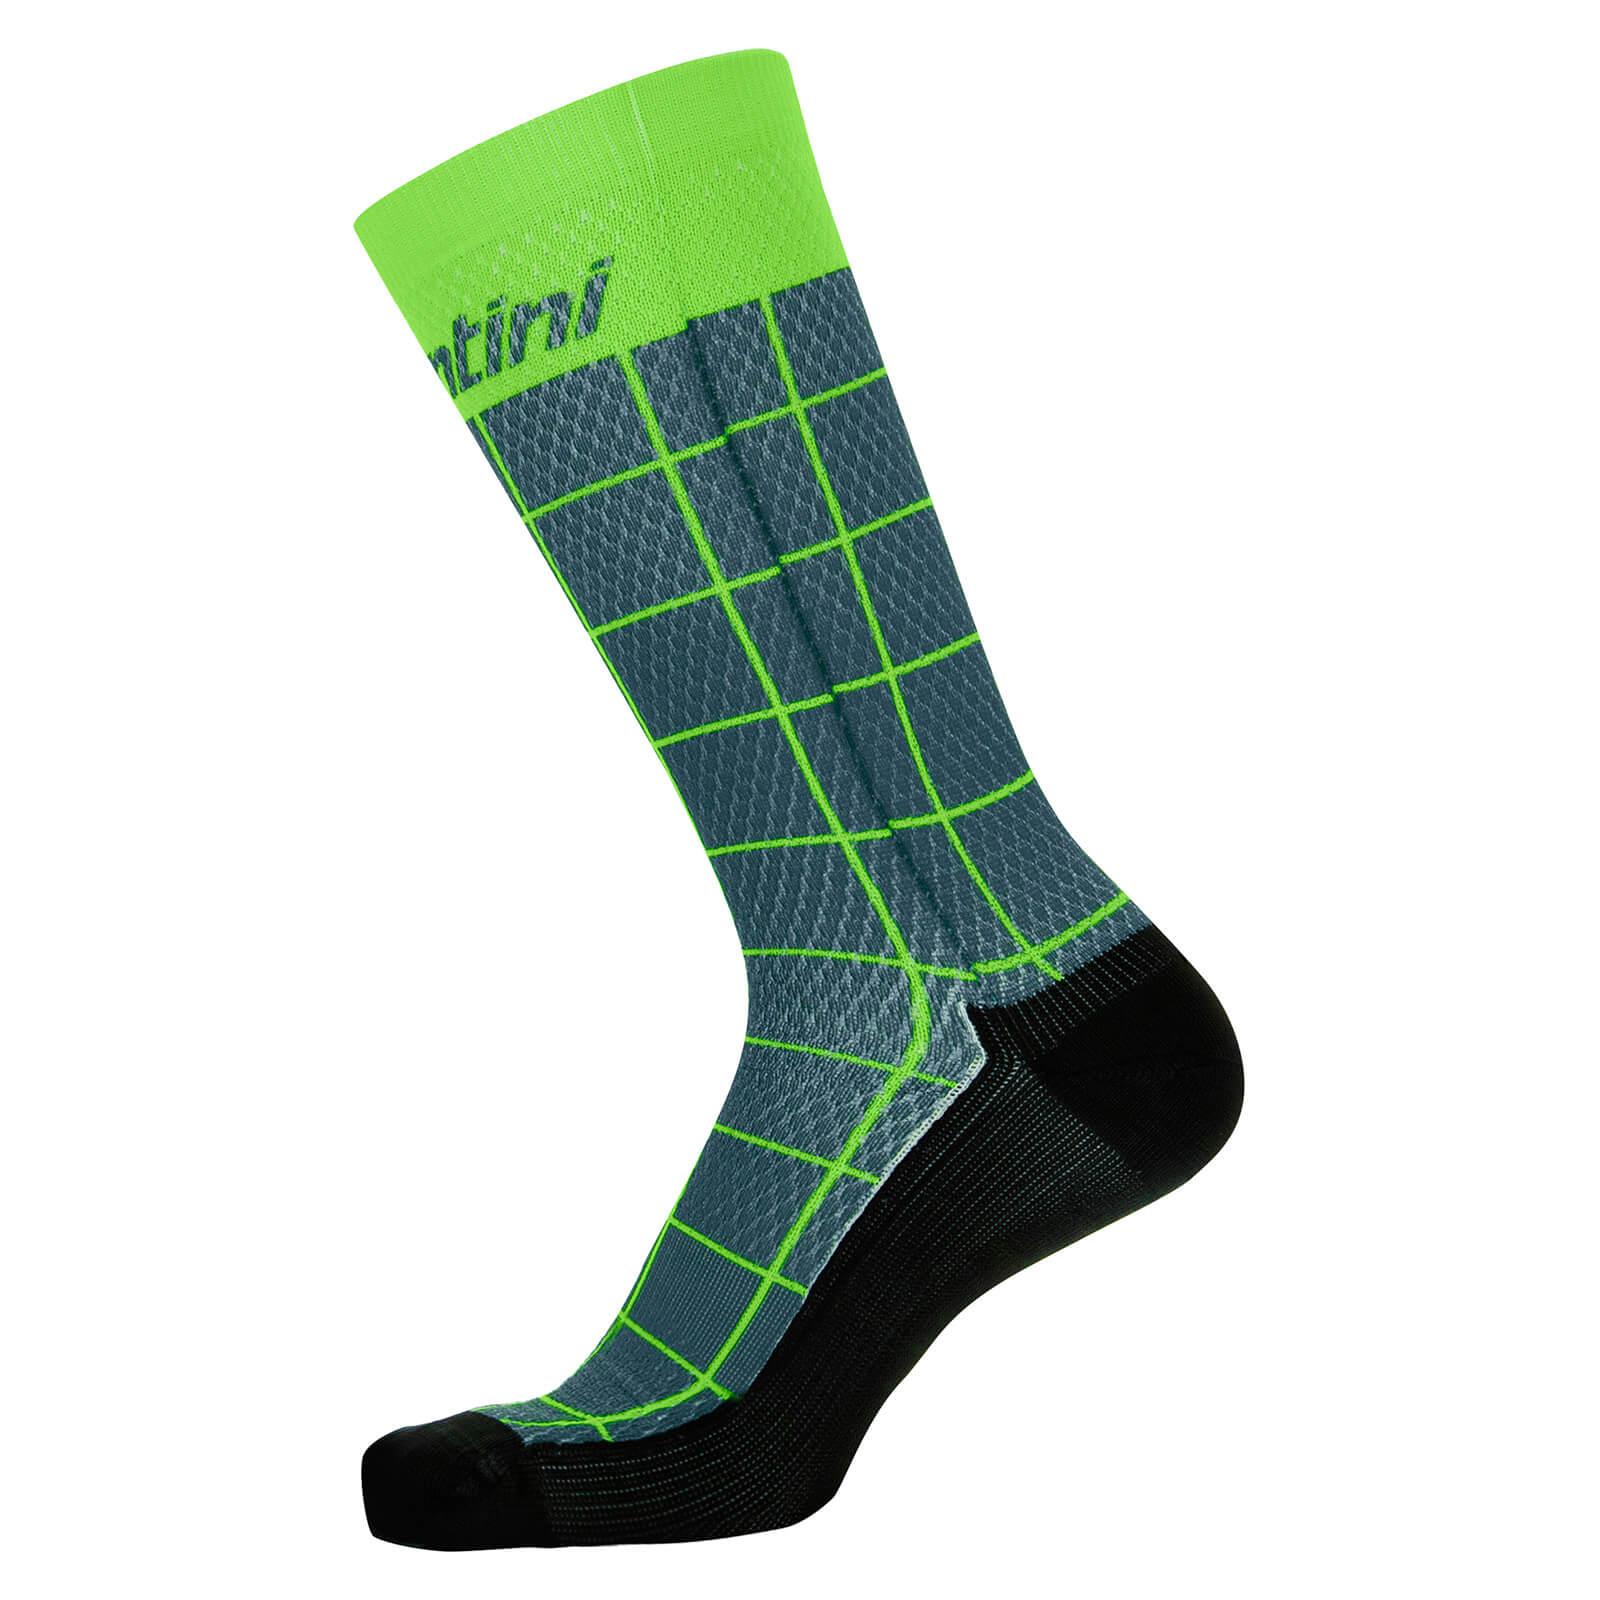 Santini Dinamo Medium Profile Printed Socks - M - Military Green